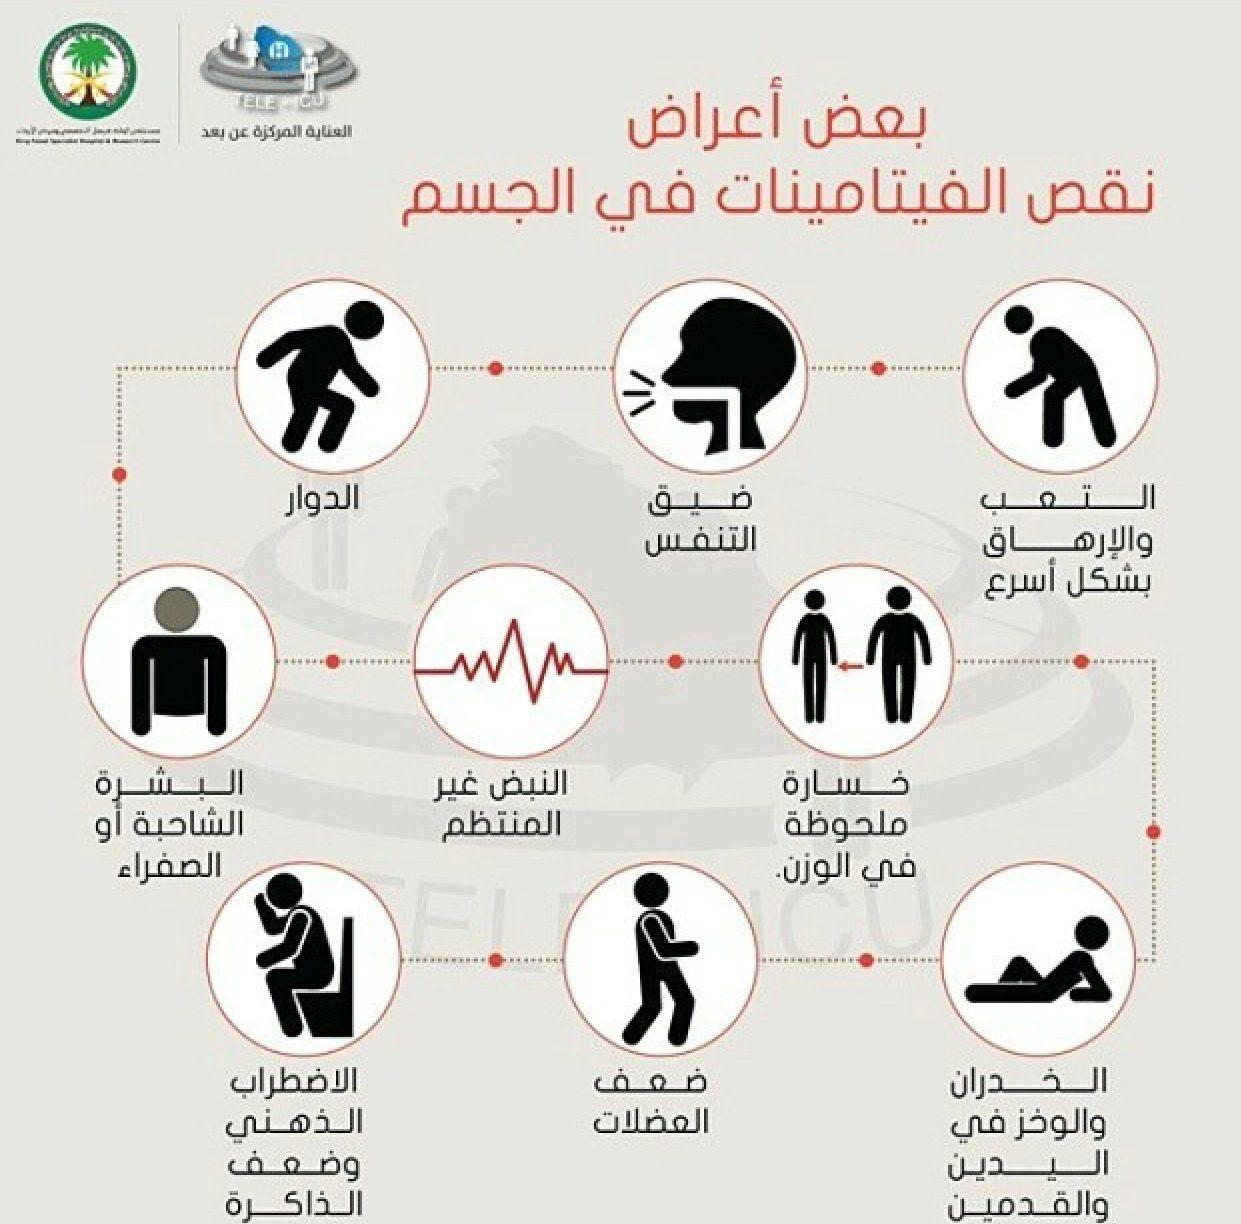 أعراض نقص الفيتامينات في الجسم Health And Beauty Tips Chores For Kids Infographic